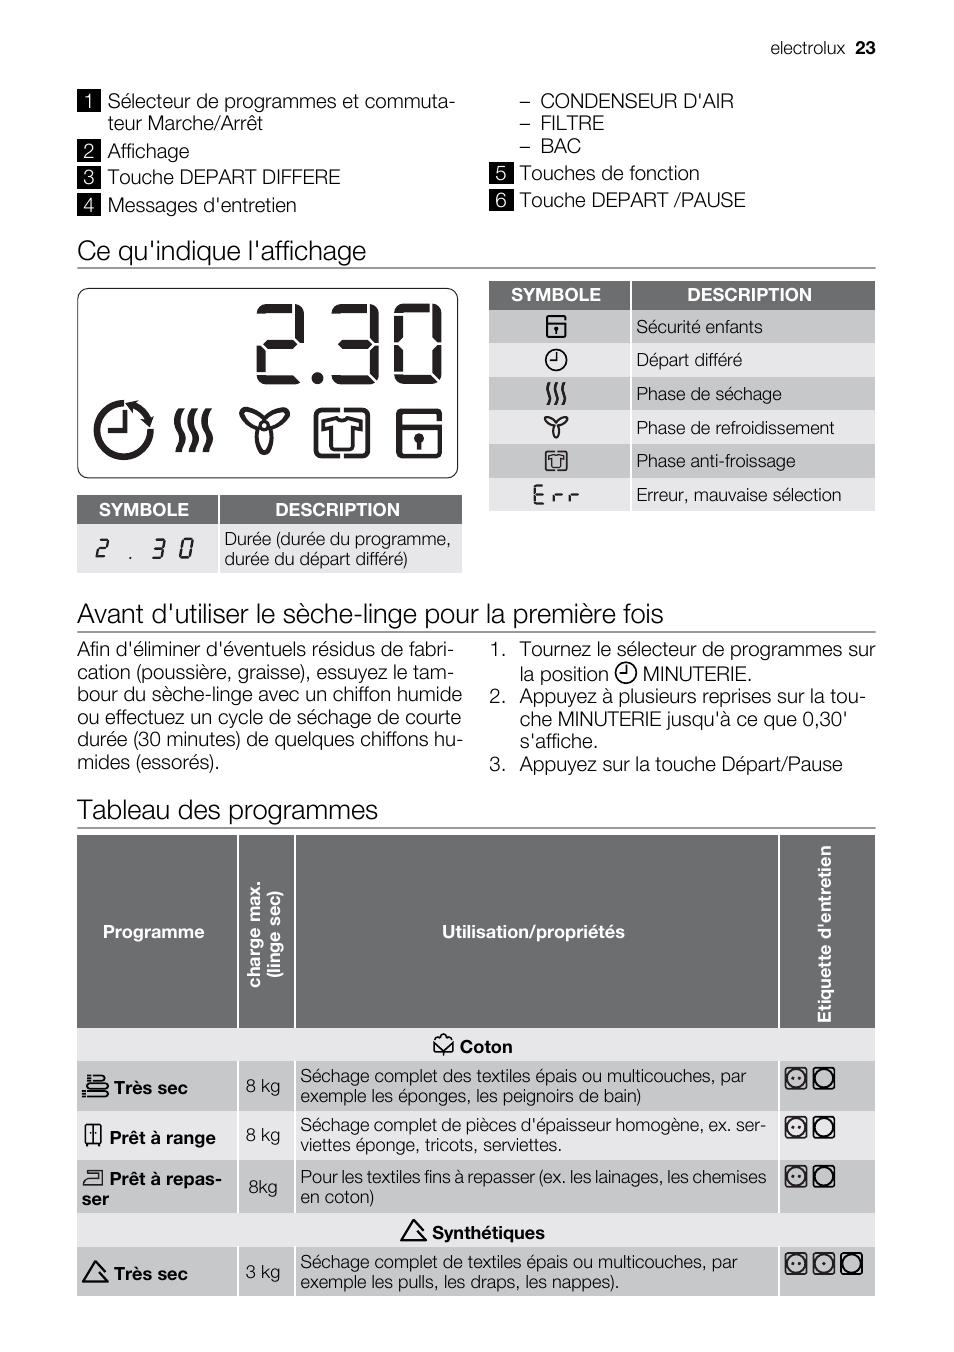 ce qu 39 indique l 39 affichage tableau des programmes electrolux edc78550w manuel d 39 utilisation. Black Bedroom Furniture Sets. Home Design Ideas